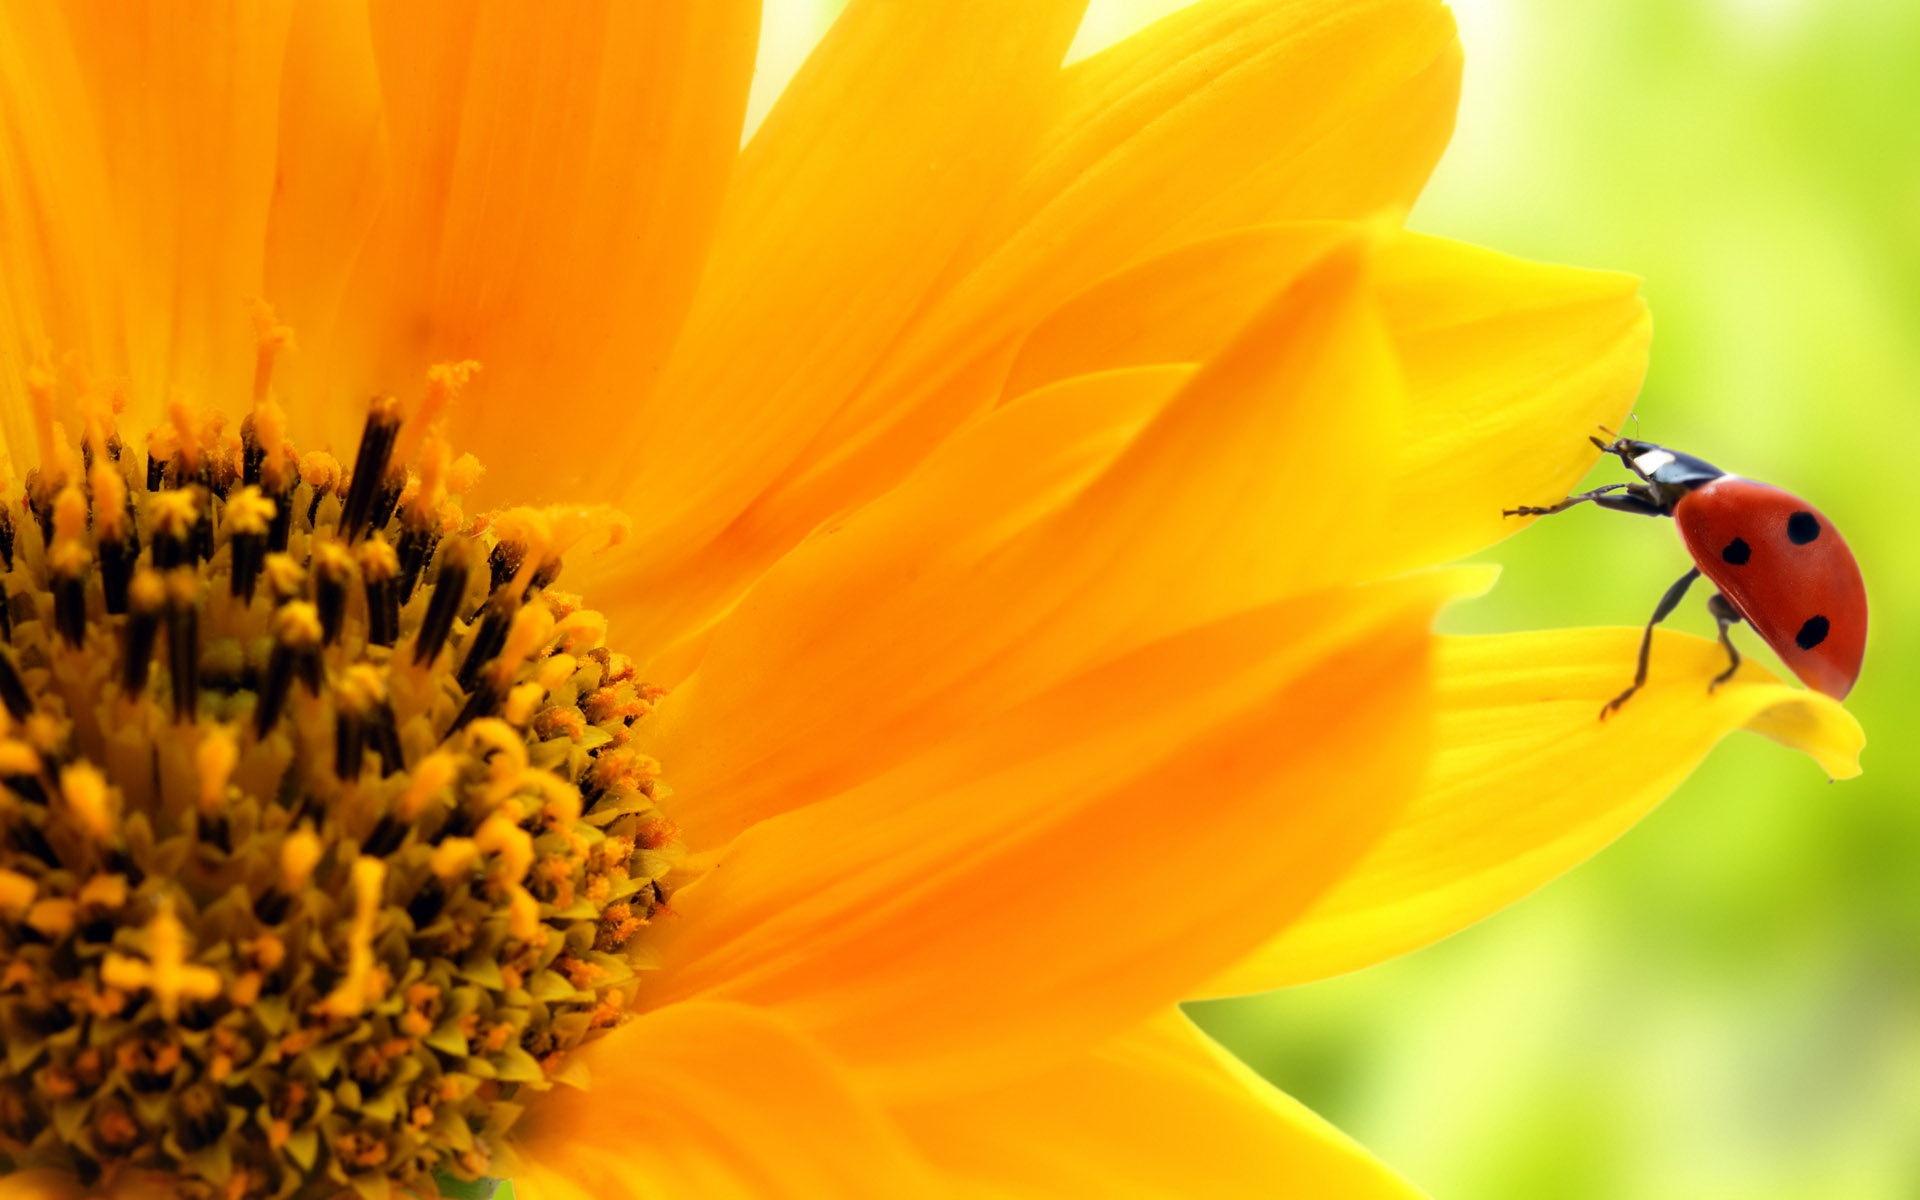 Giant Sunflower Pictures Hd Desktop Wallpapers 4k Hd